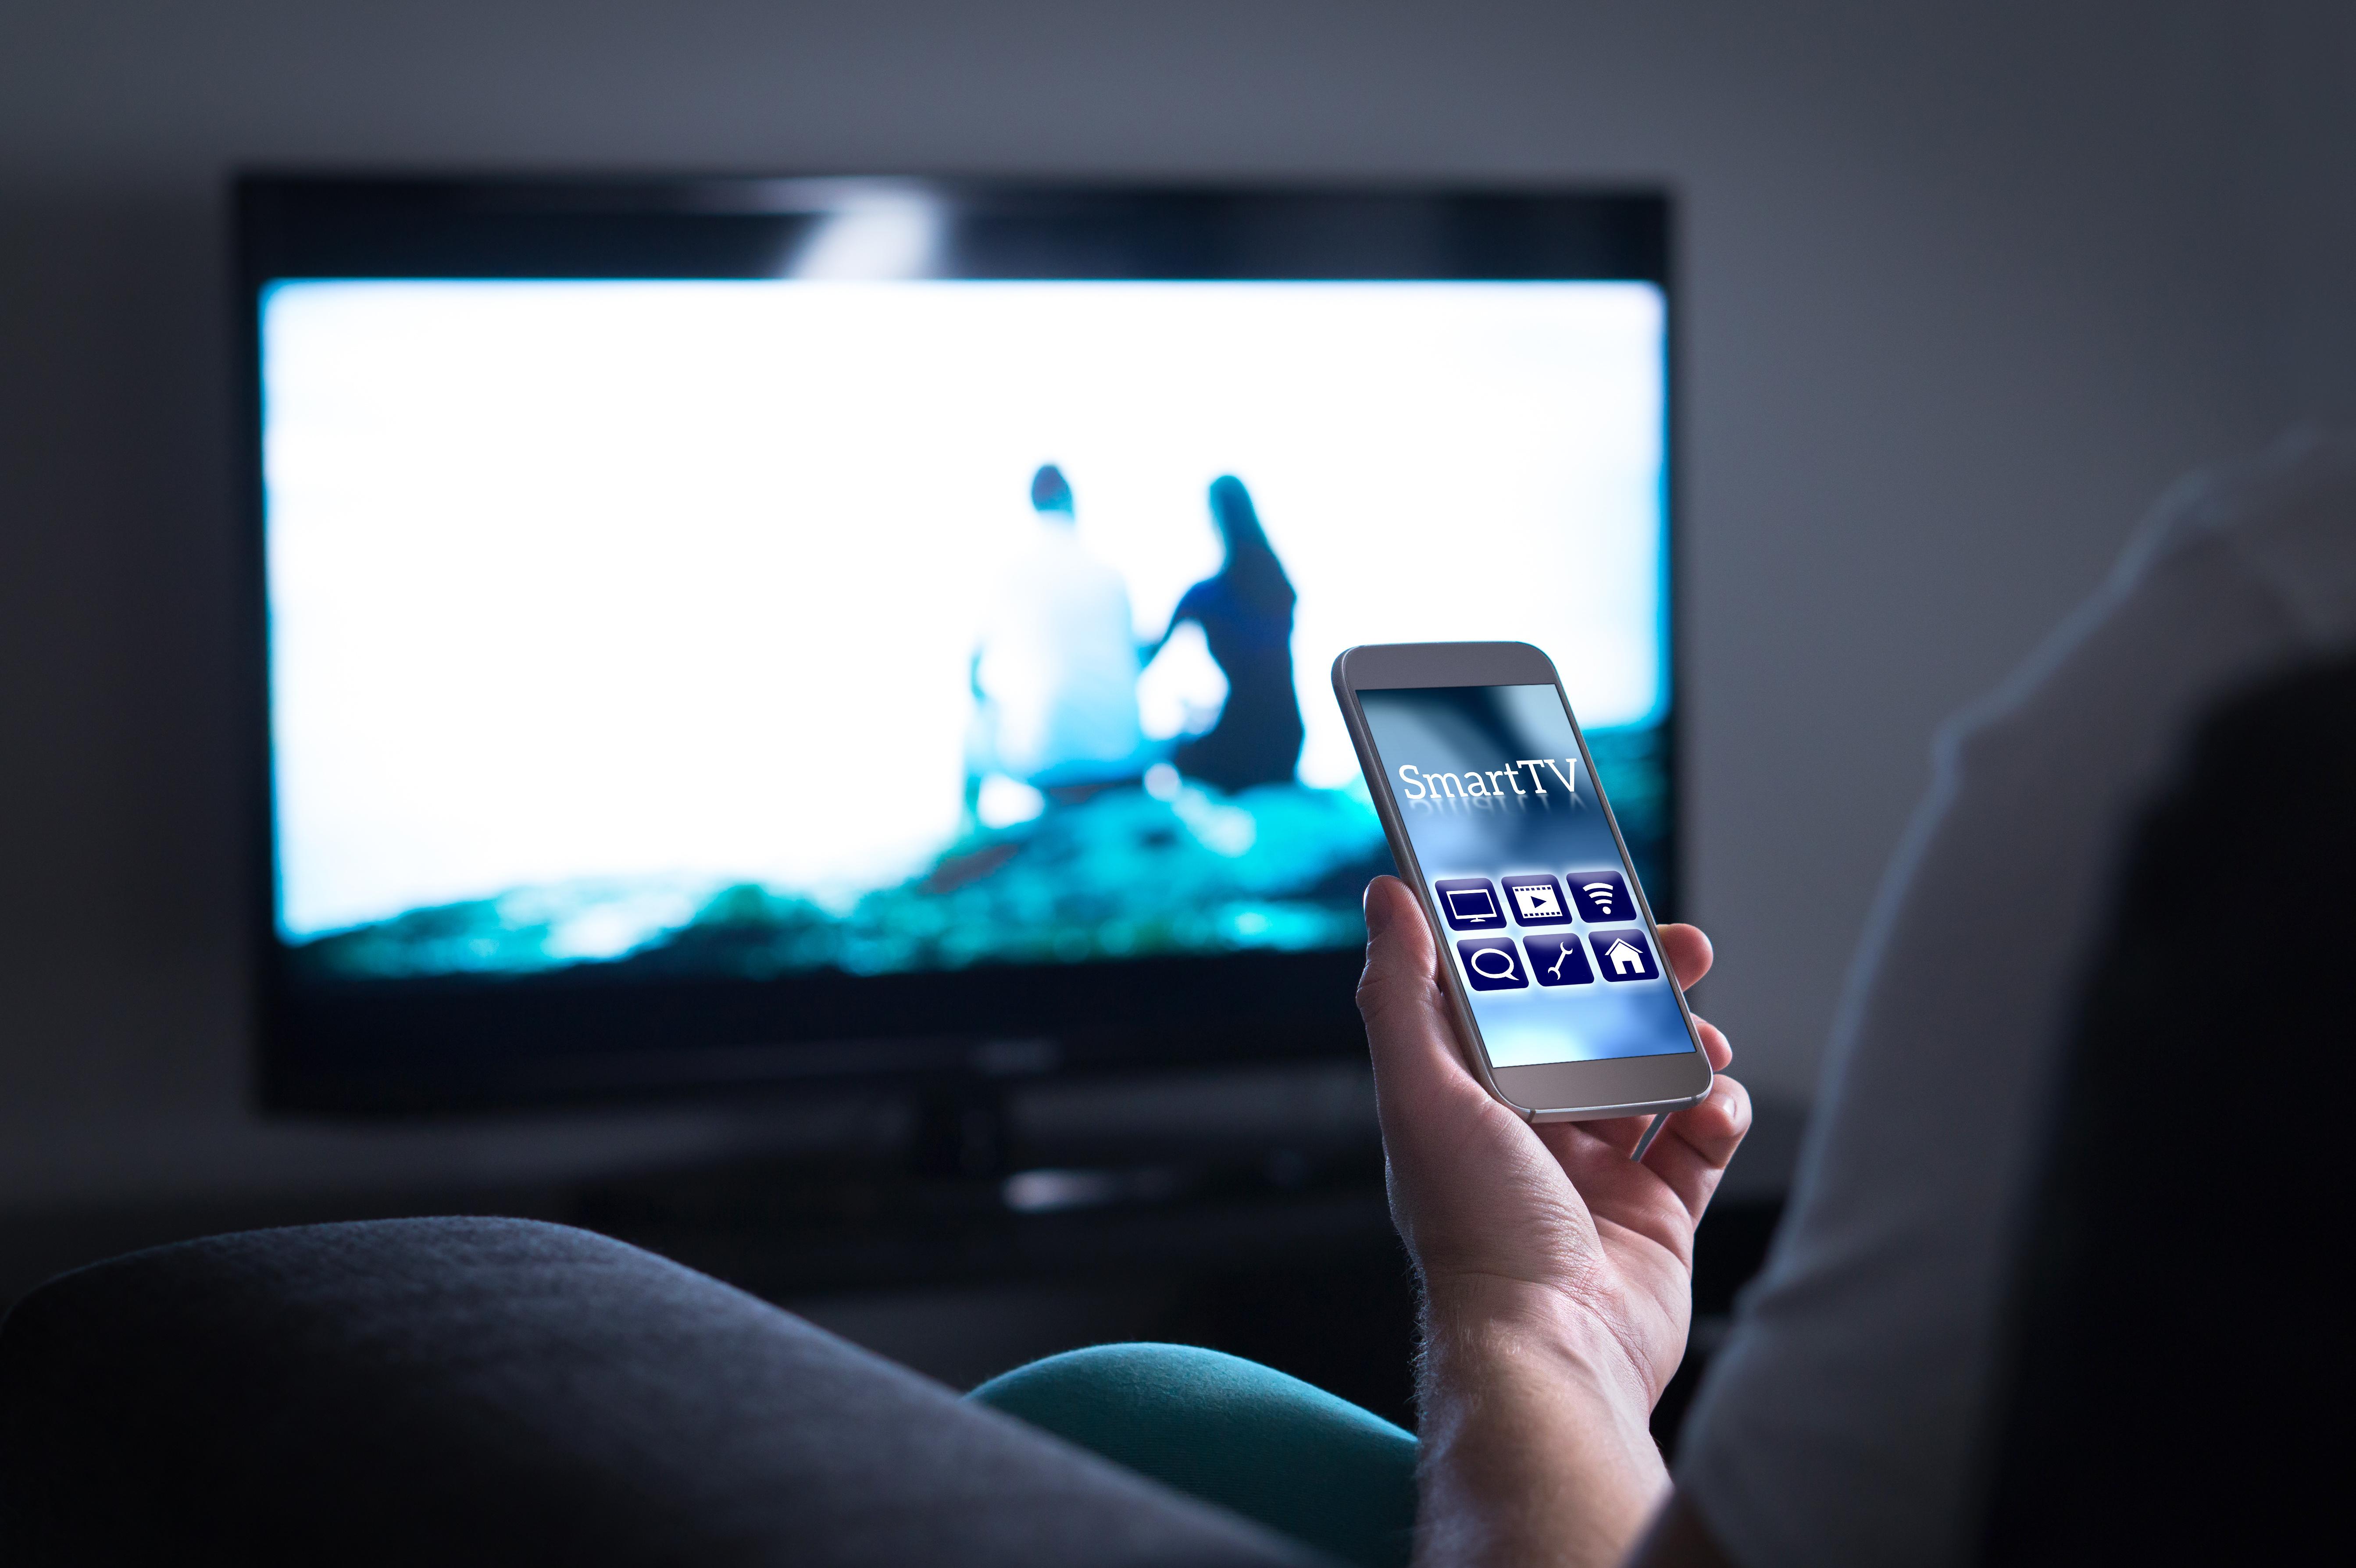 TalkTalk swings to small first-half profit after adding new broadband customers